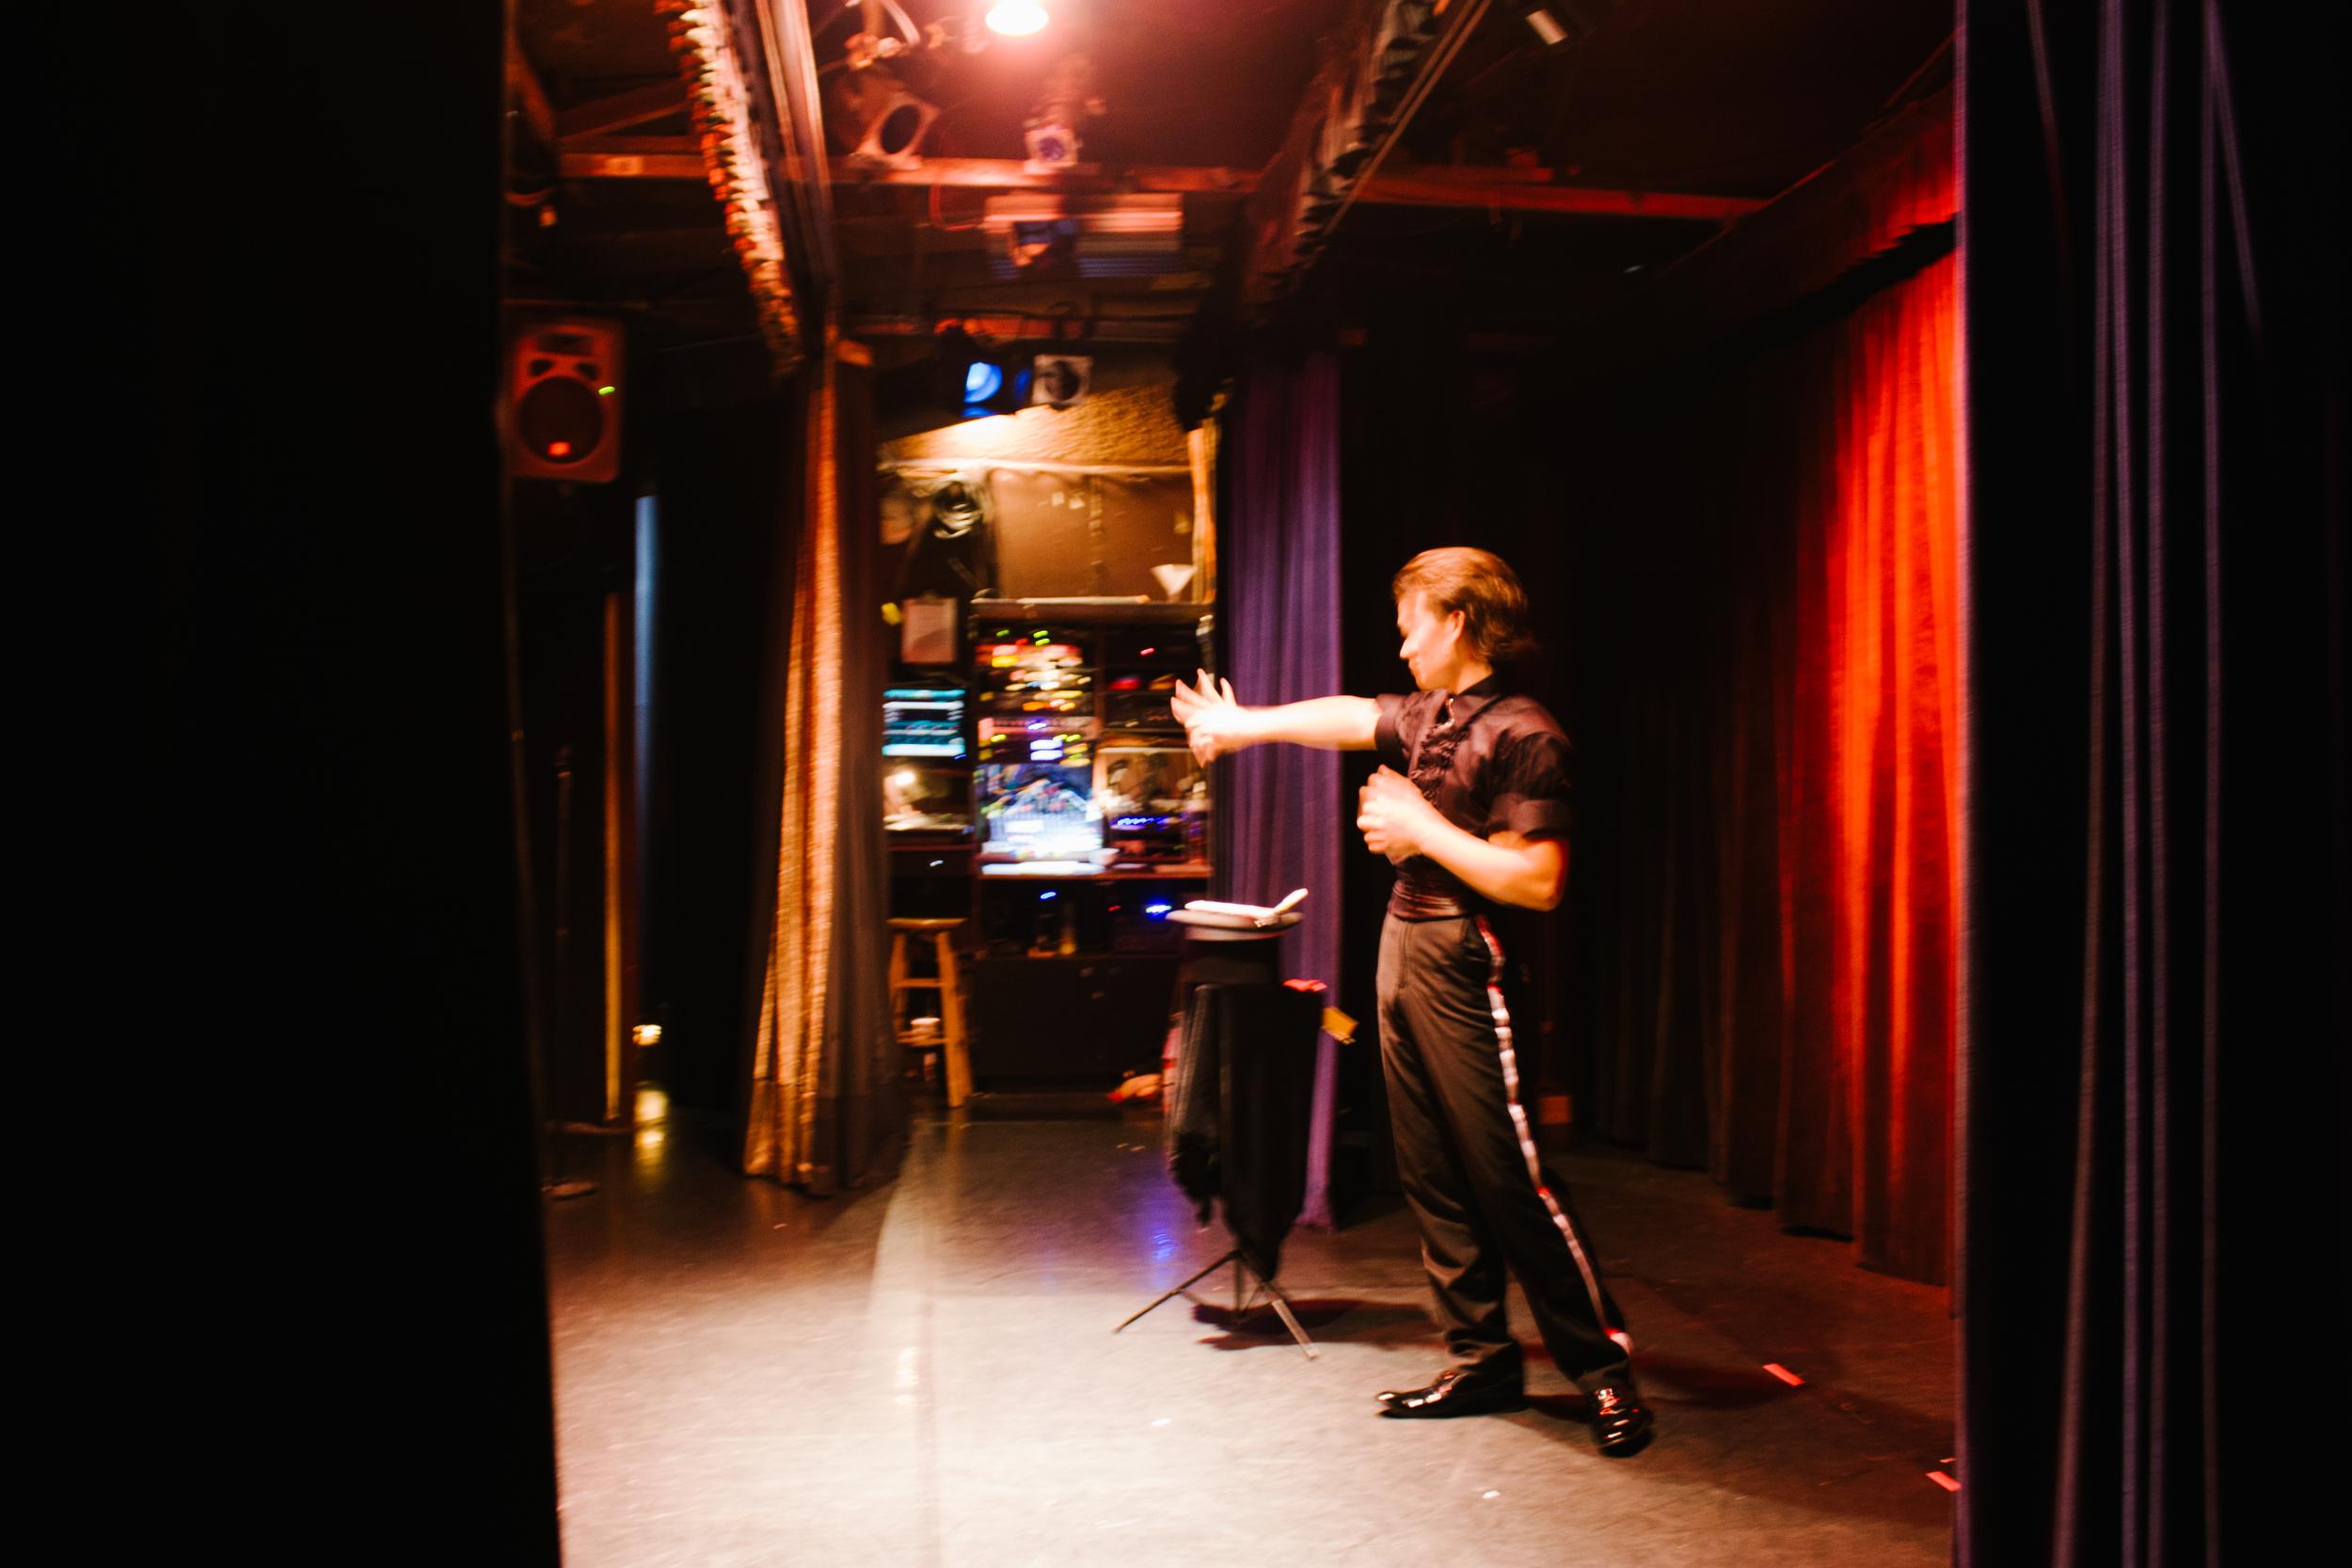 Hyuma Miyahara backstage at the Magic Castle. Photo by Barak Wright.